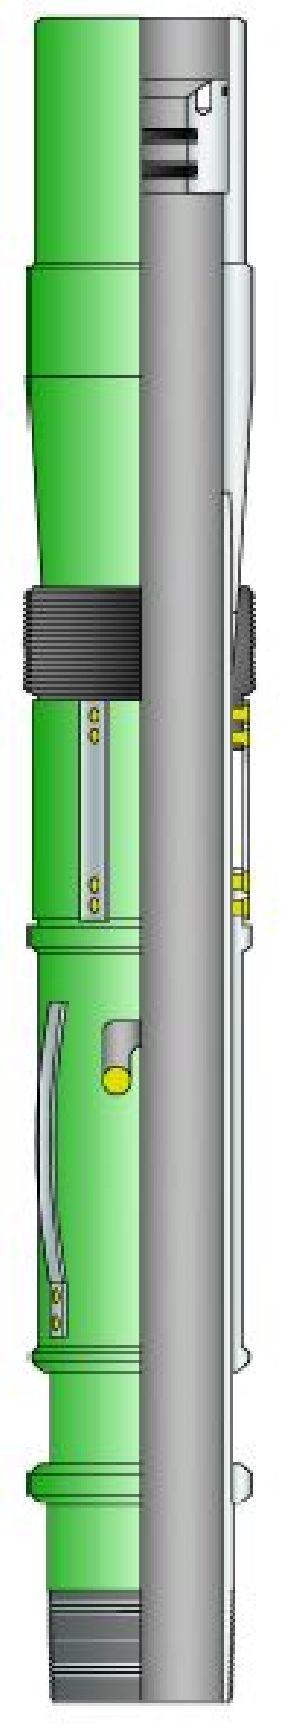 Mechanical Liner Hanger